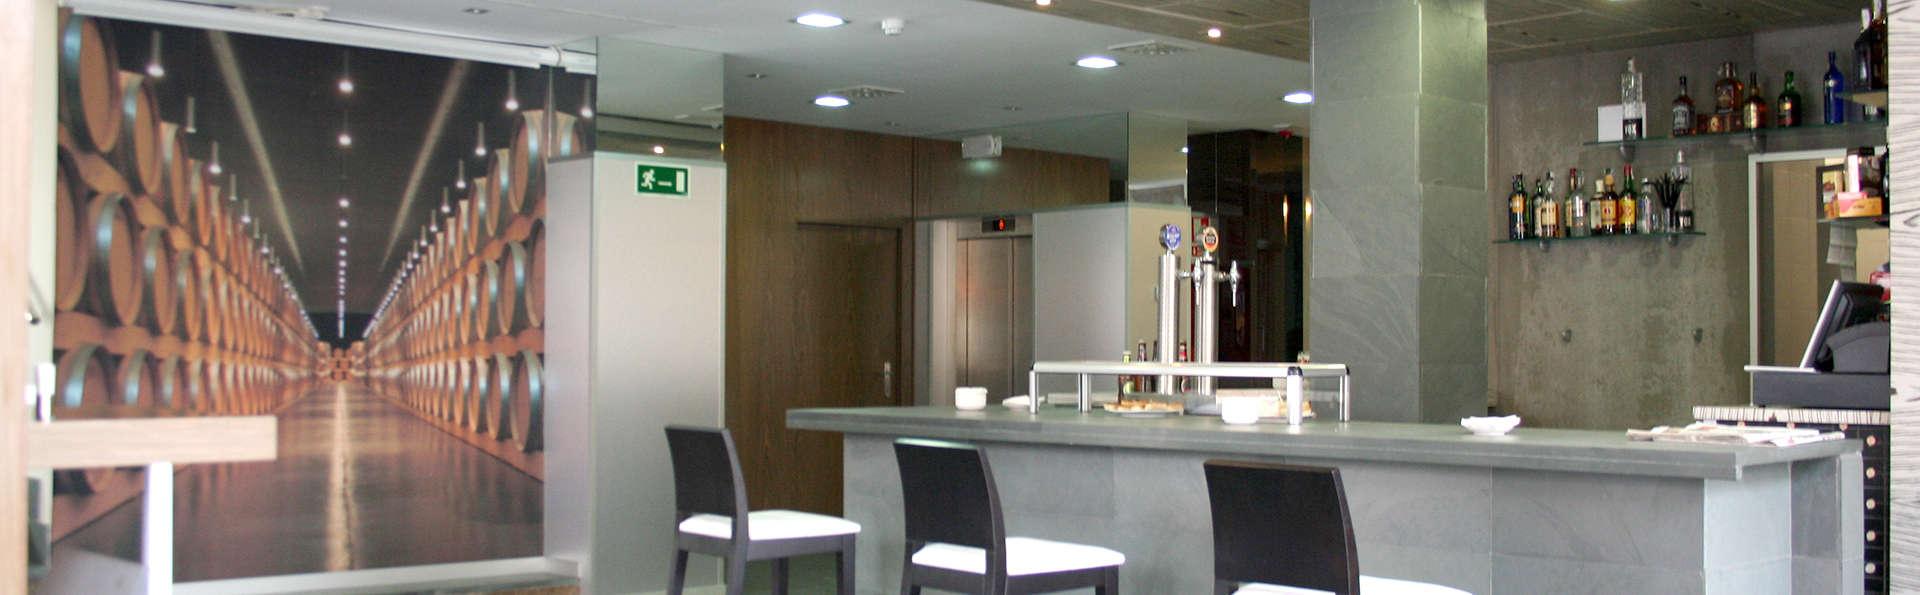 Duero Hotel  - Edit_Bar.jpg